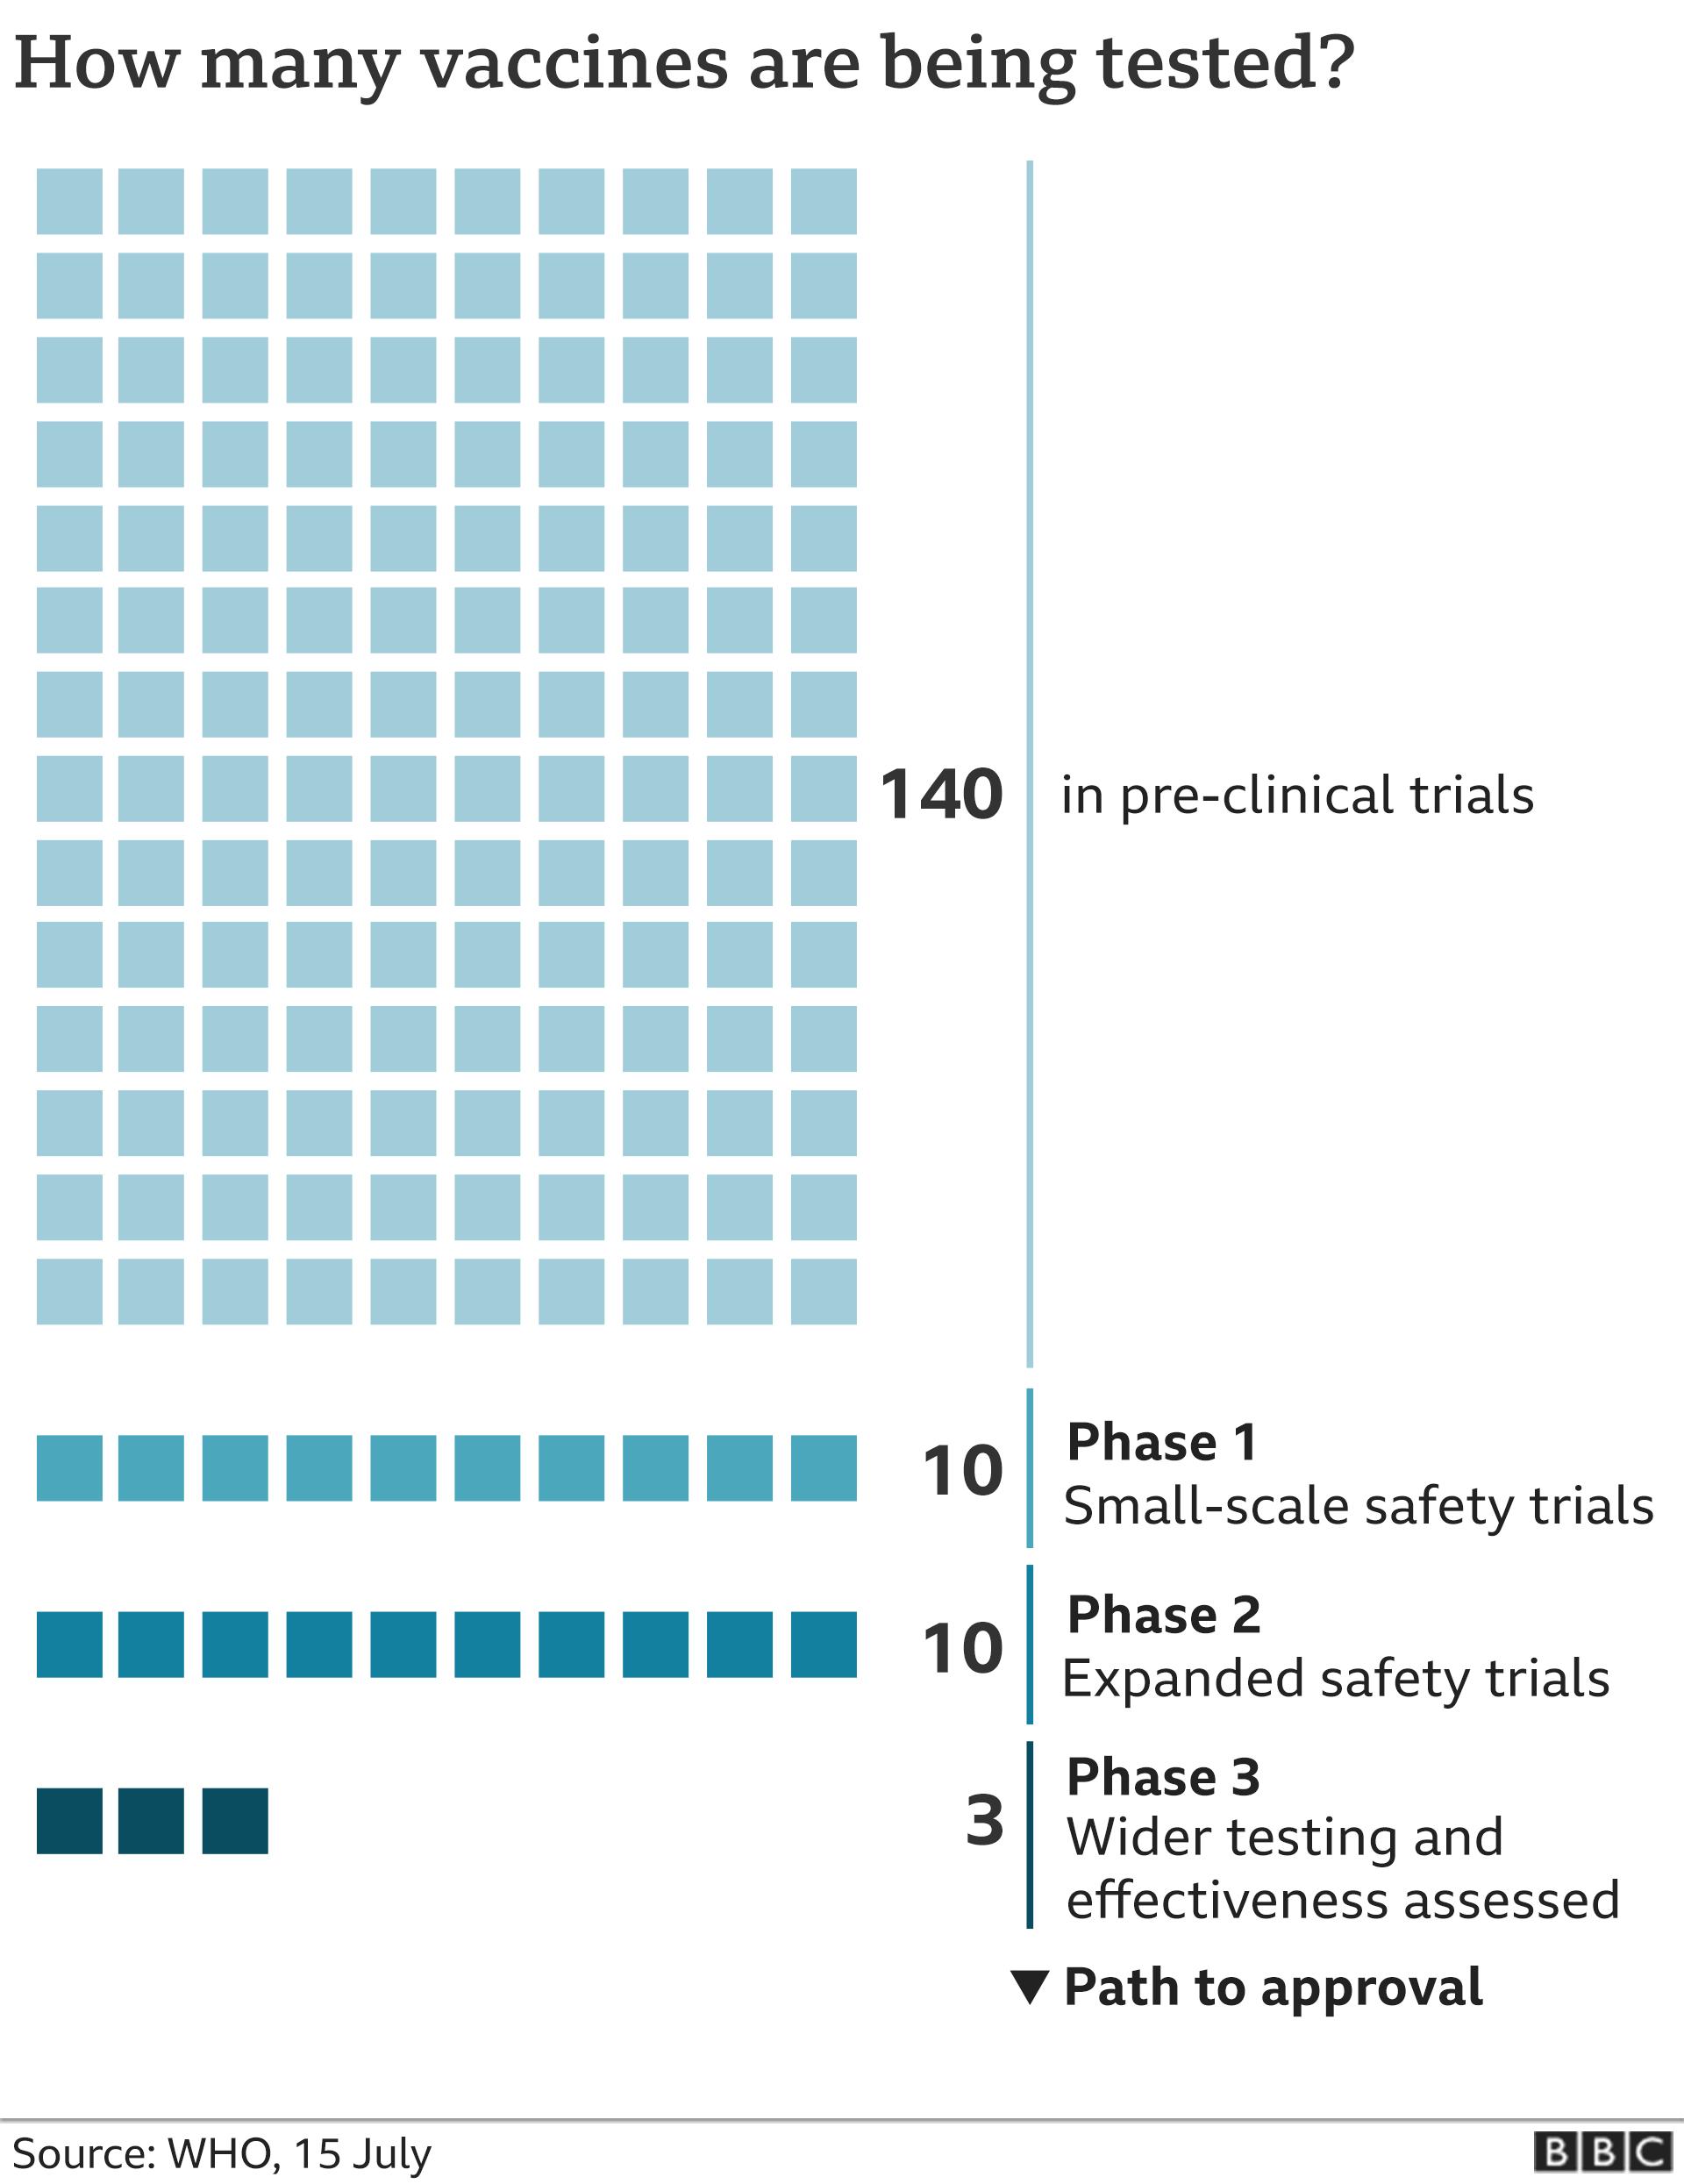 Vaccines in development graphic